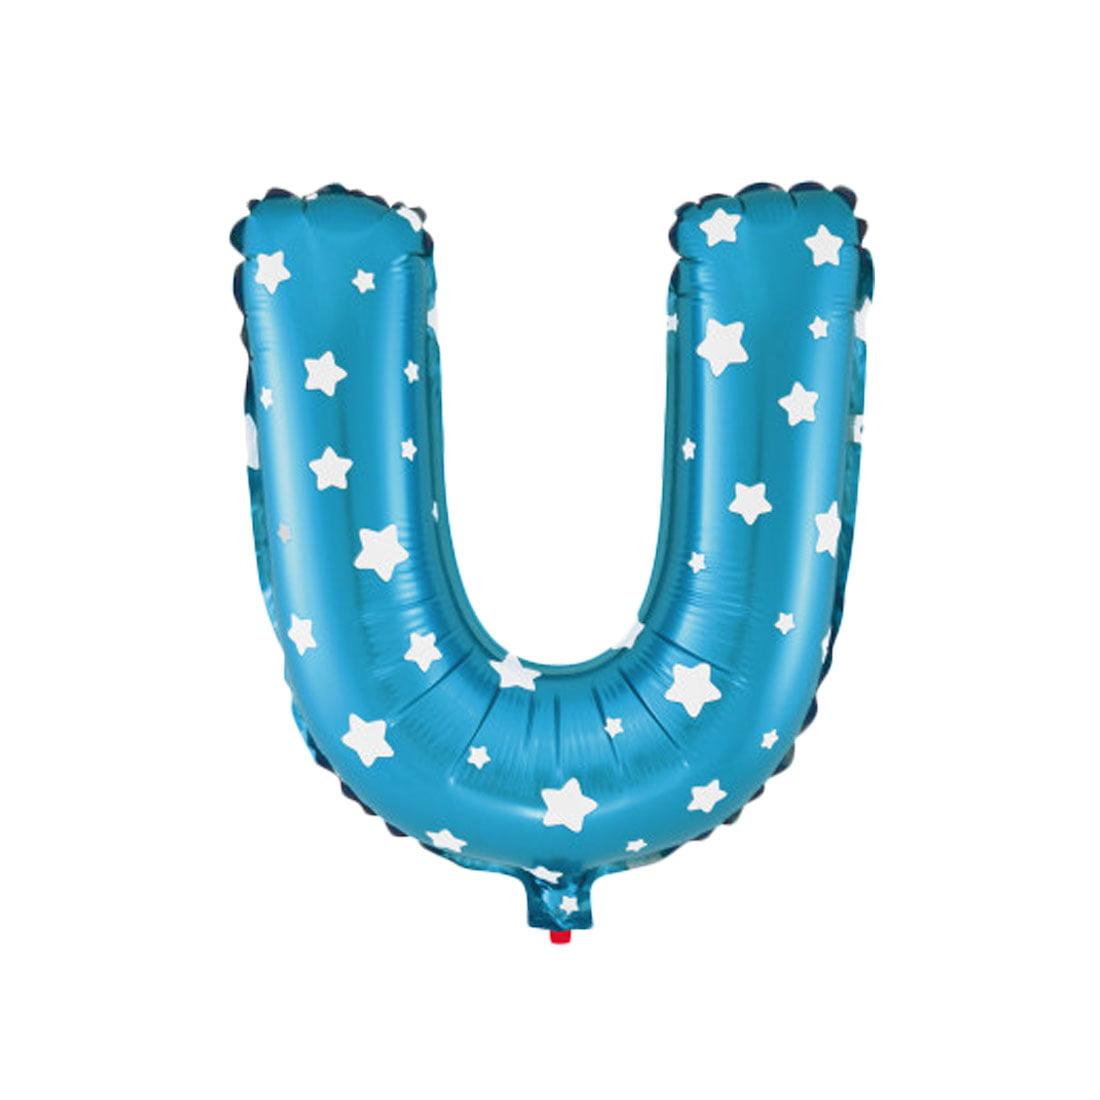 "Unique Bargains 16"" Blue Foil Letter U Balloon Helium Birthday Wedding Festival Decor"